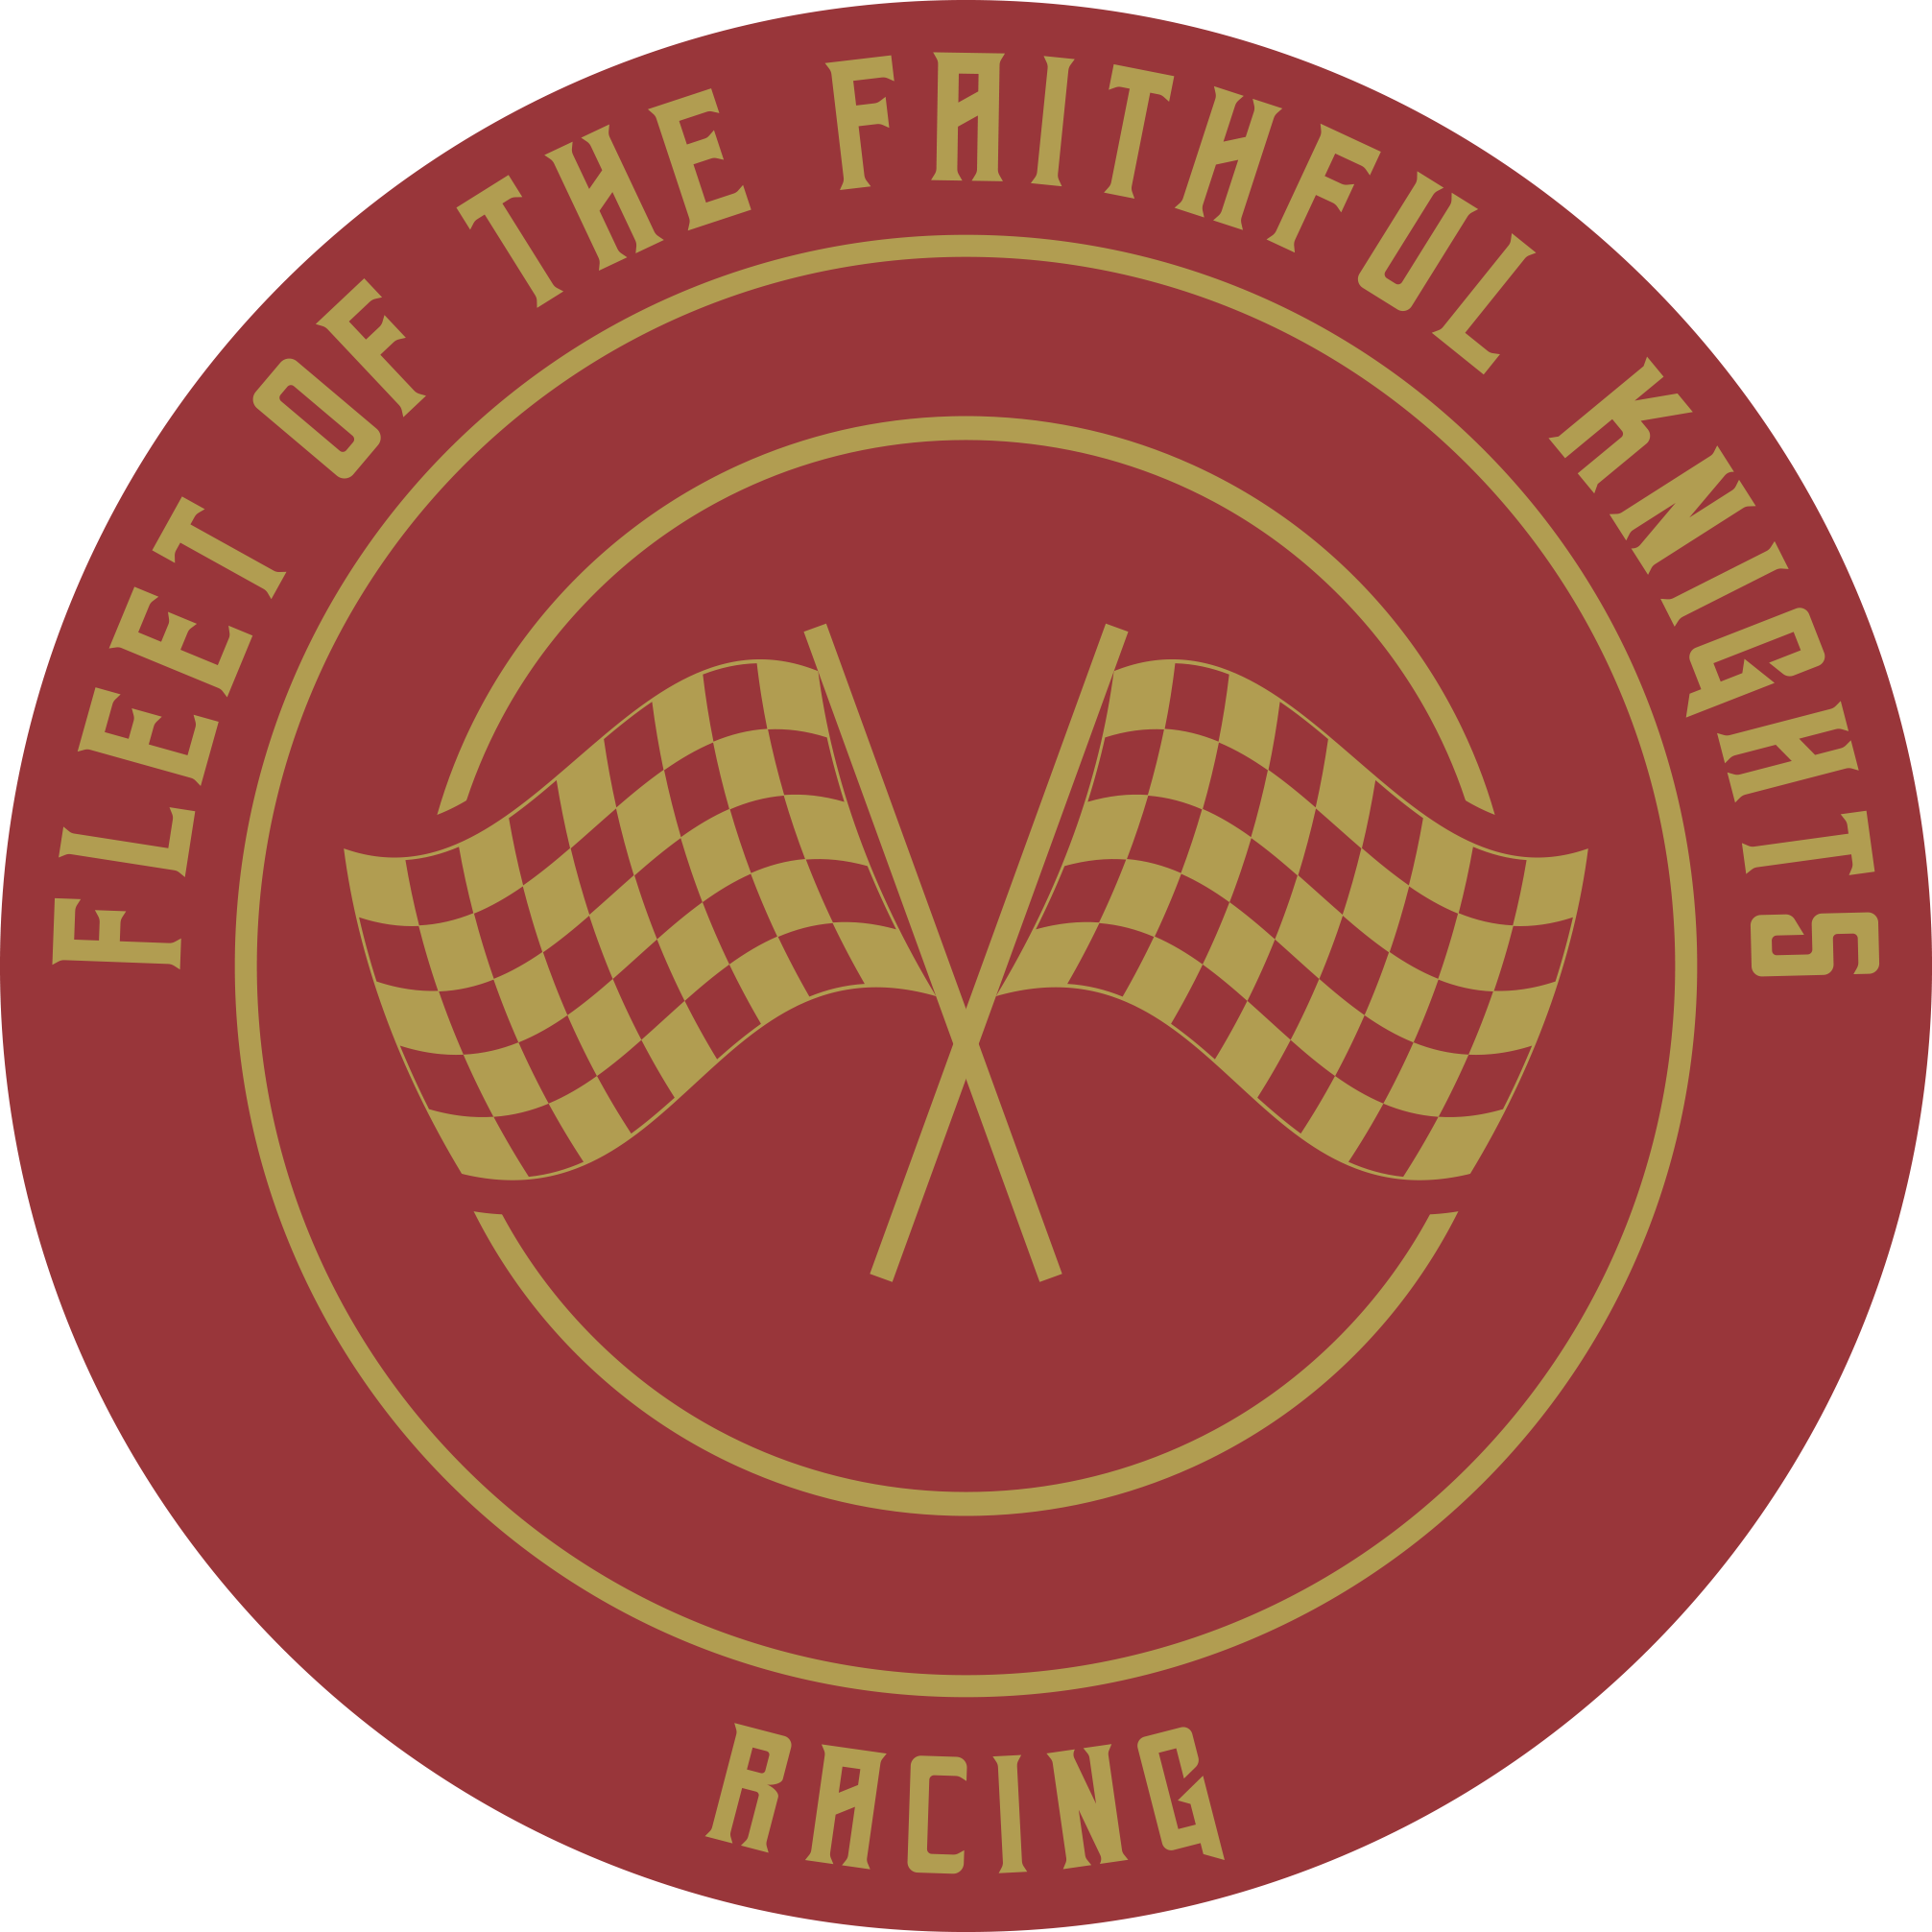 Fleet of the faithful knights emblem   racing1